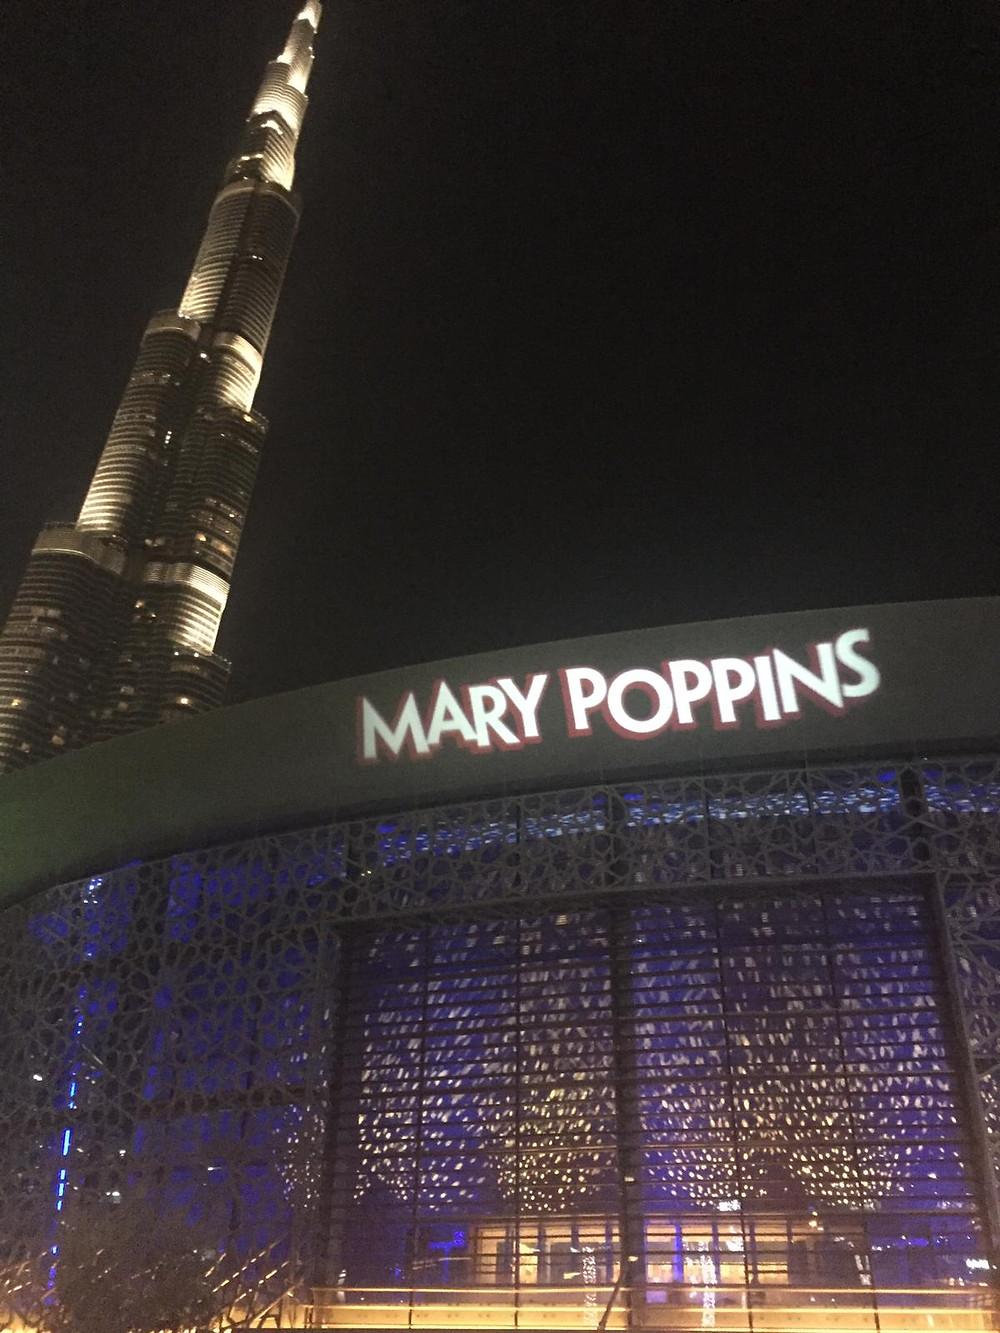 Mary Poppins opening night, Dubai